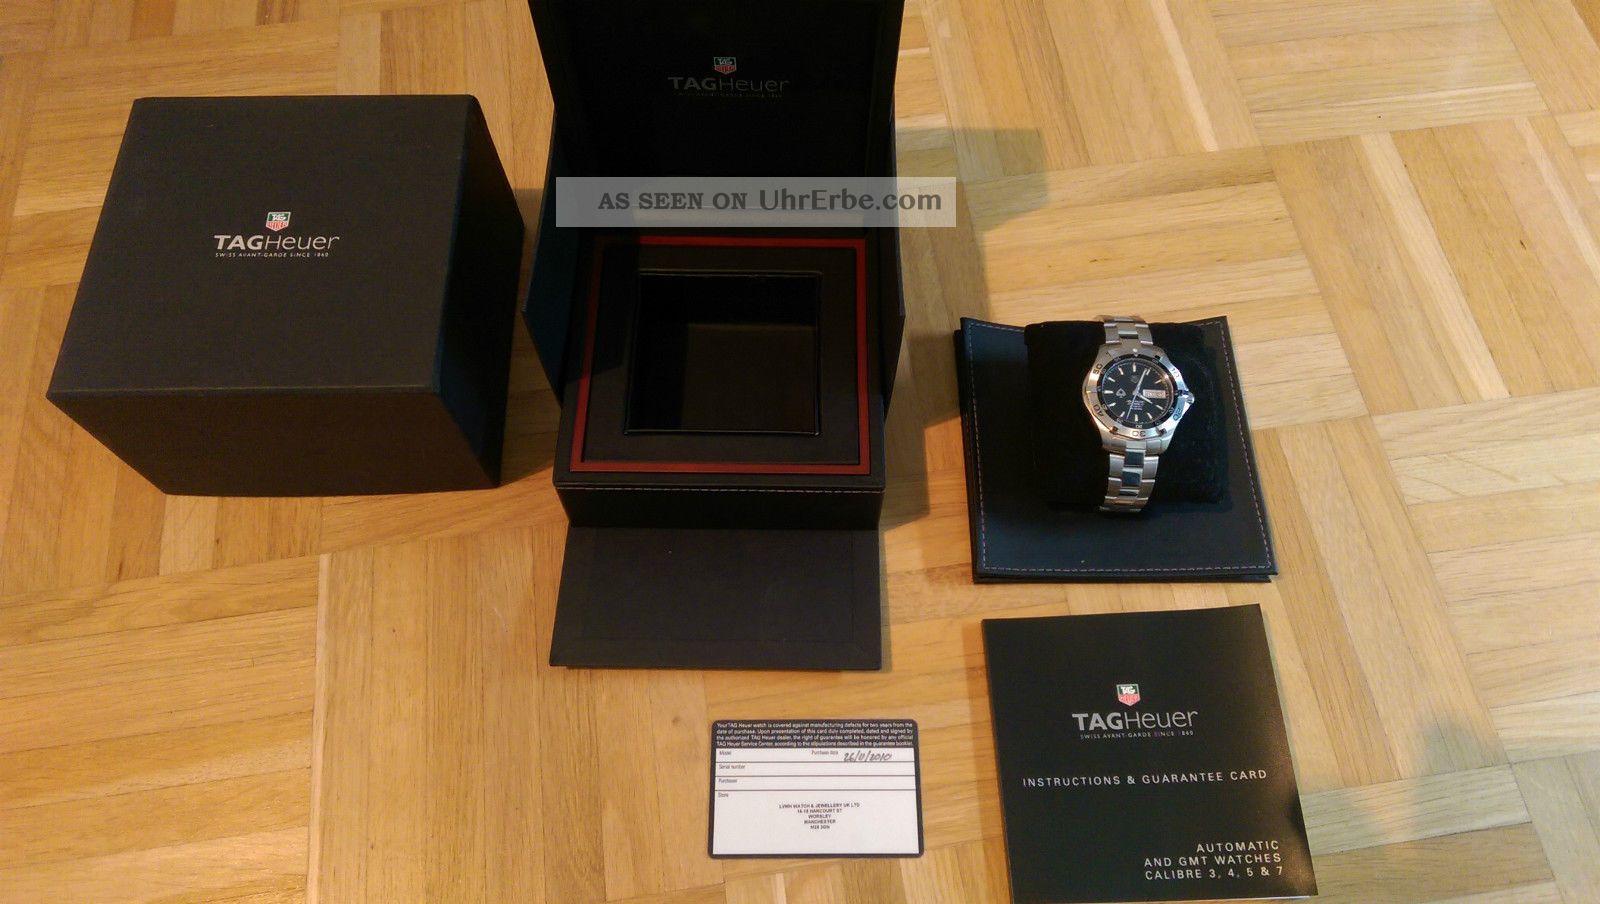 Tag Heuer Aquaracer Calibre 5 300m - Pokerstars Limited Edition Waf2013 Armbanduhren Bild